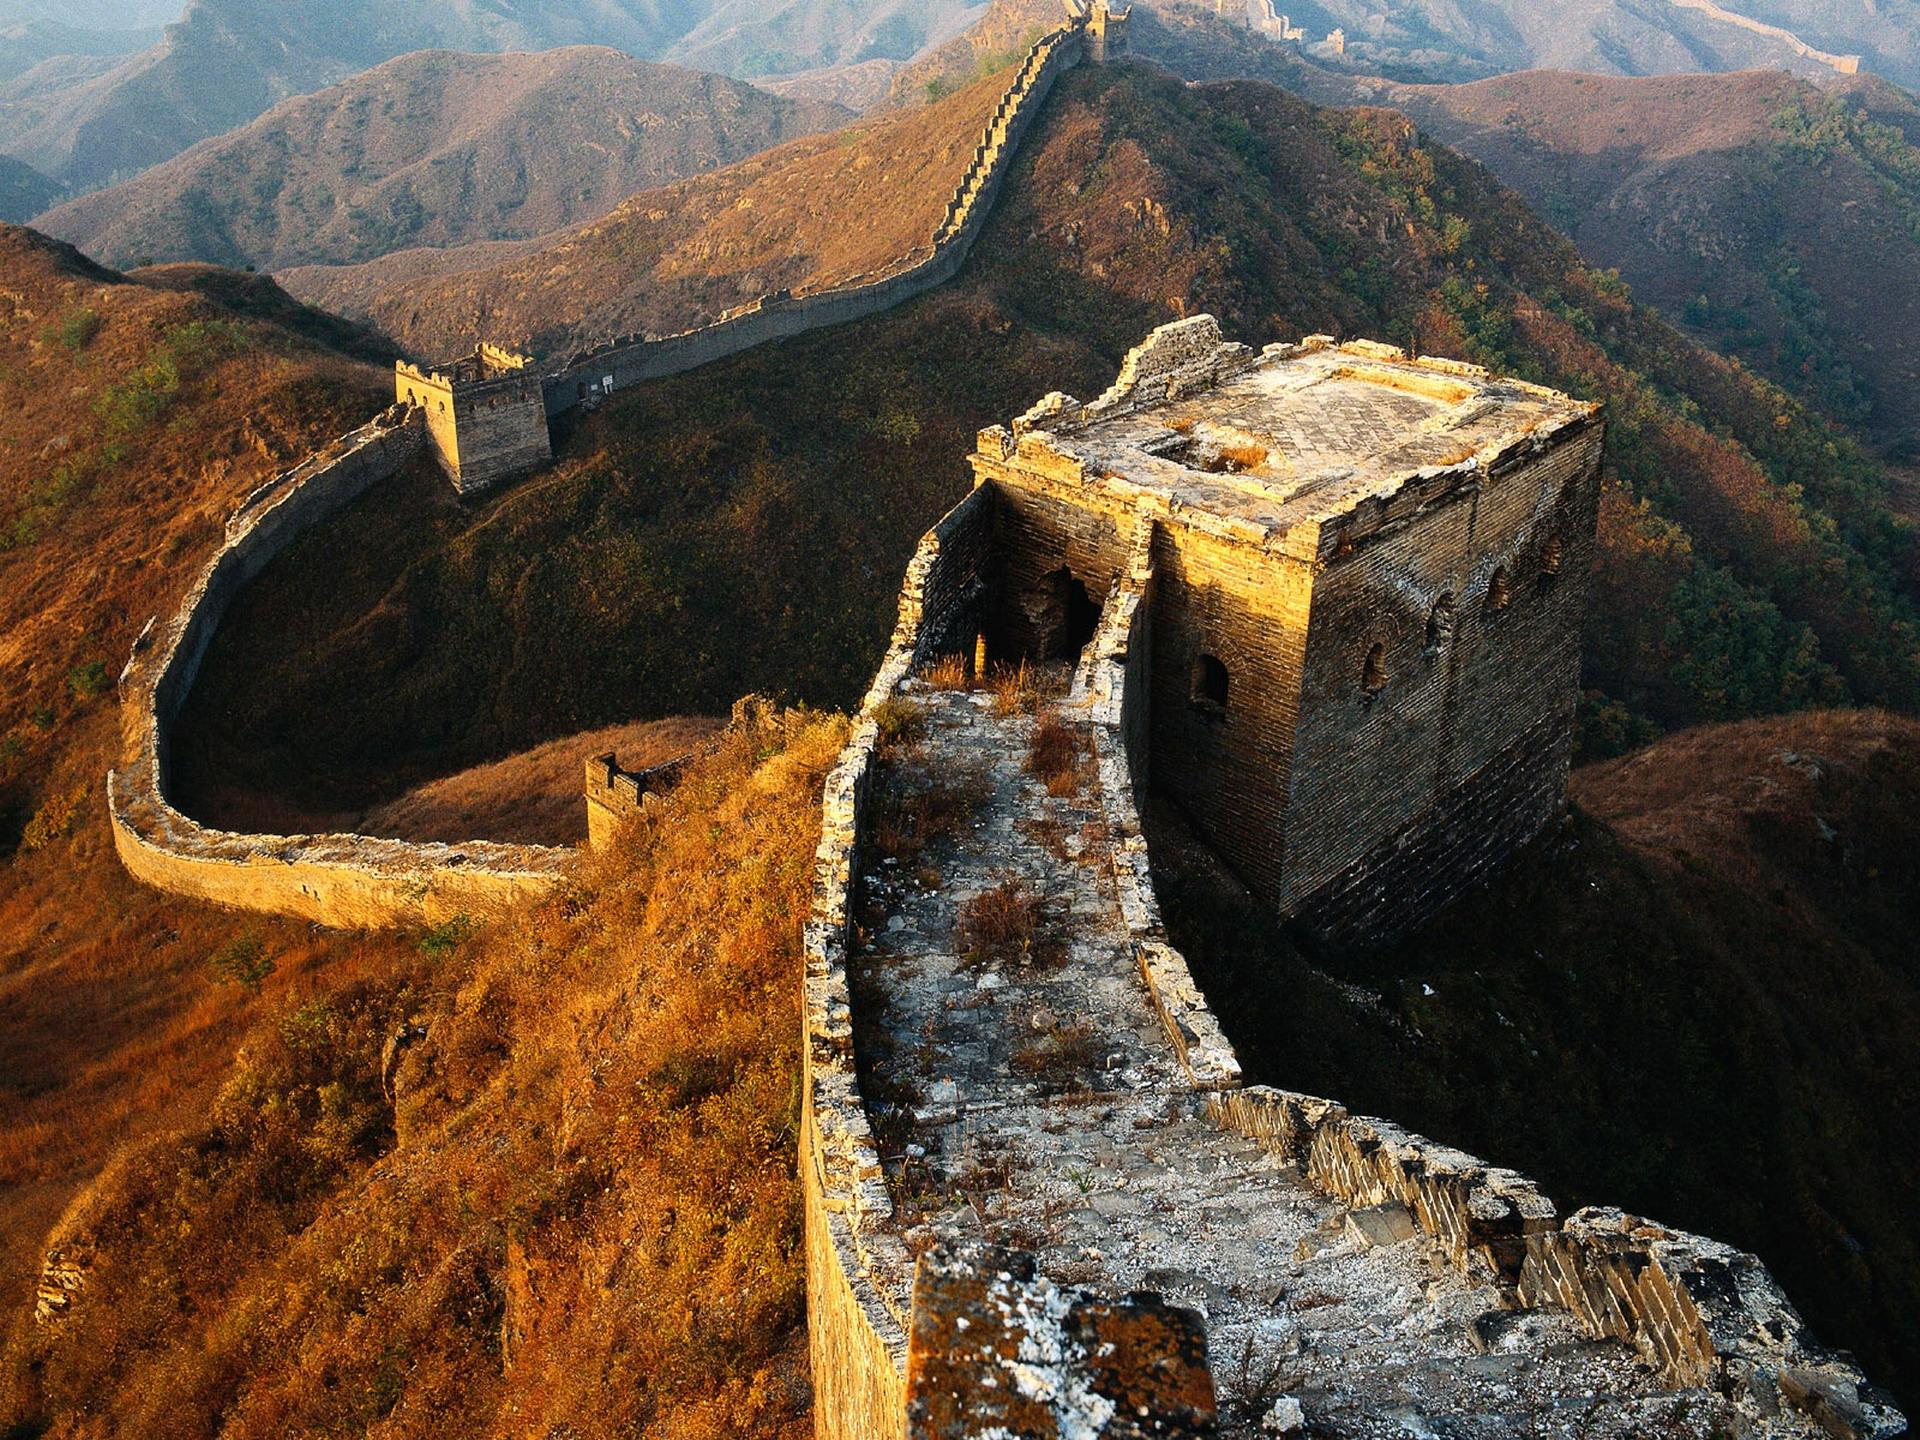 Papel de parede muralha da china wallpaper para download for Papel de pared paisajes